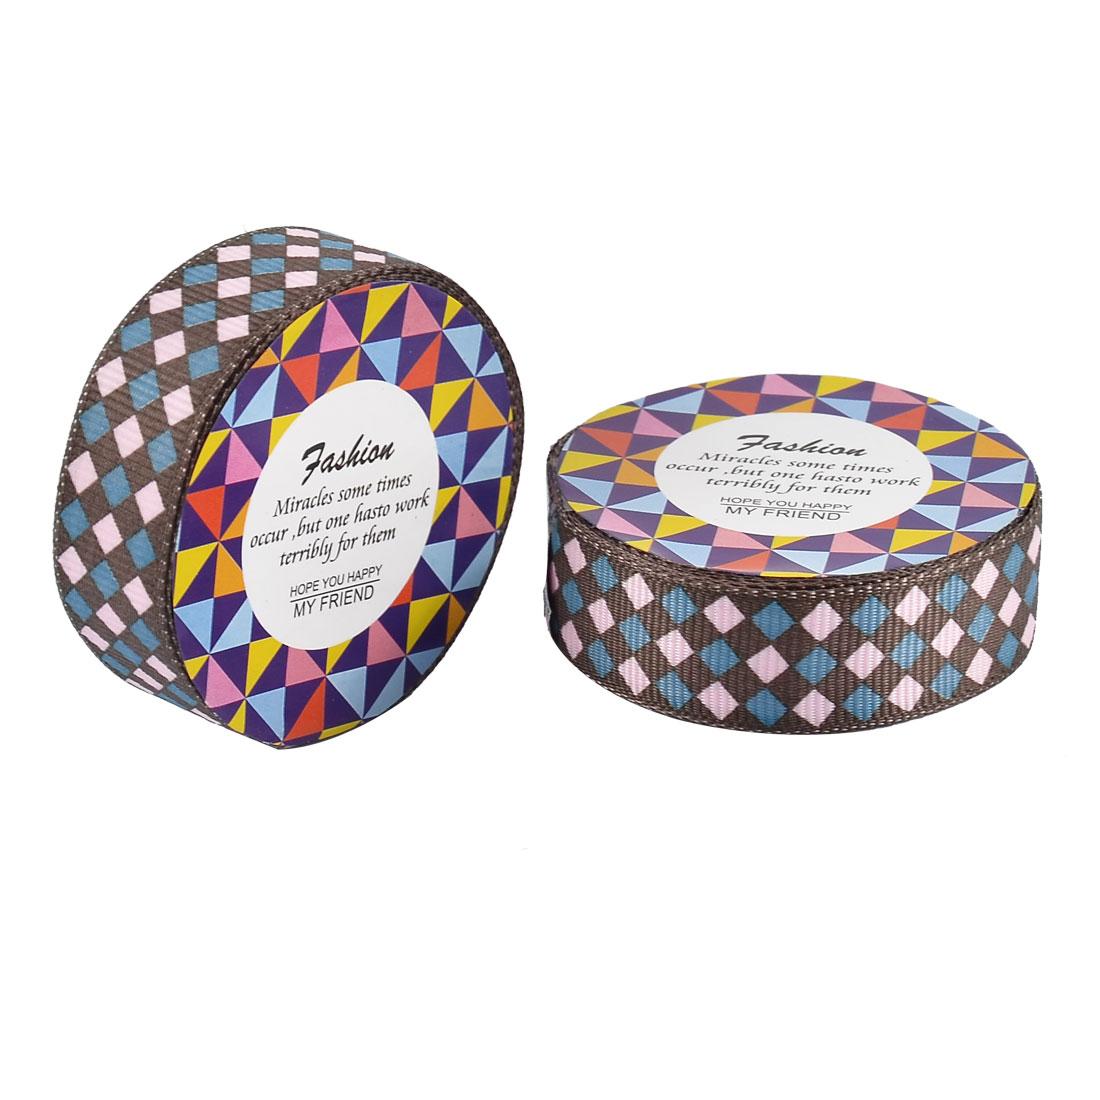 Home Nylon Rhombic Pattern Adhesive Photo Album Decorative Tape Pink Blue 2 Pcs